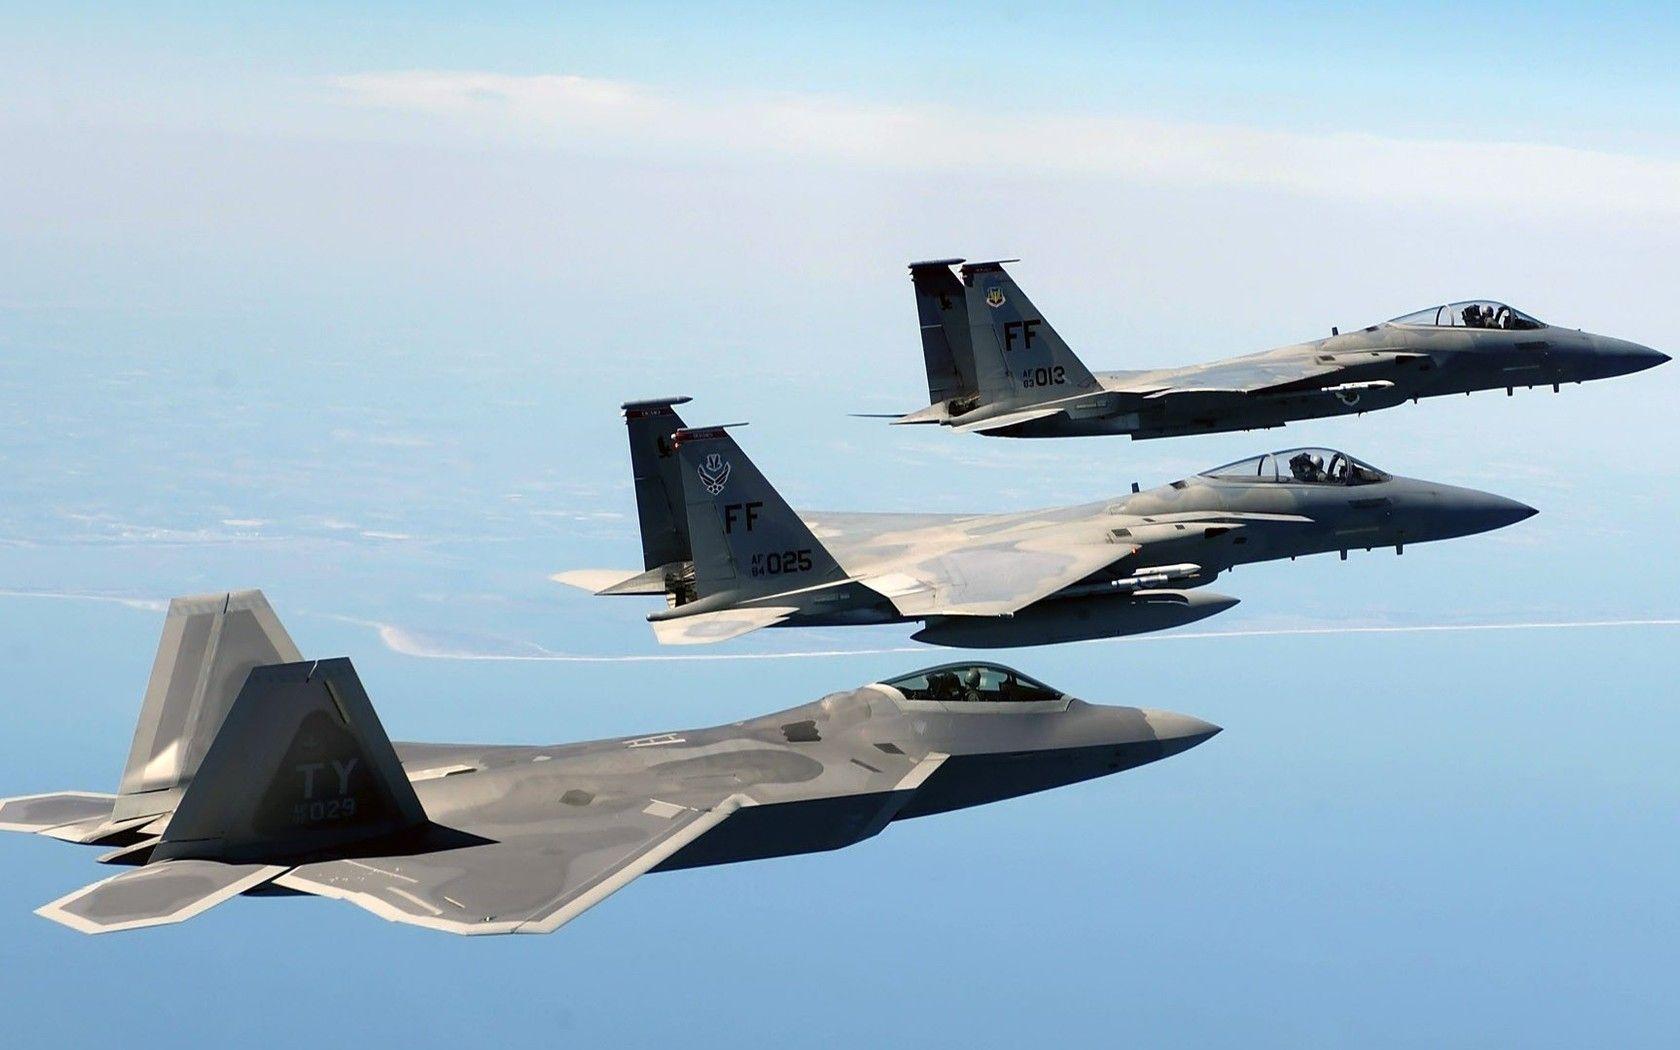 Lockheed Martin F 21 Raptor   Fighter jets, Fighter planes, Aircraft